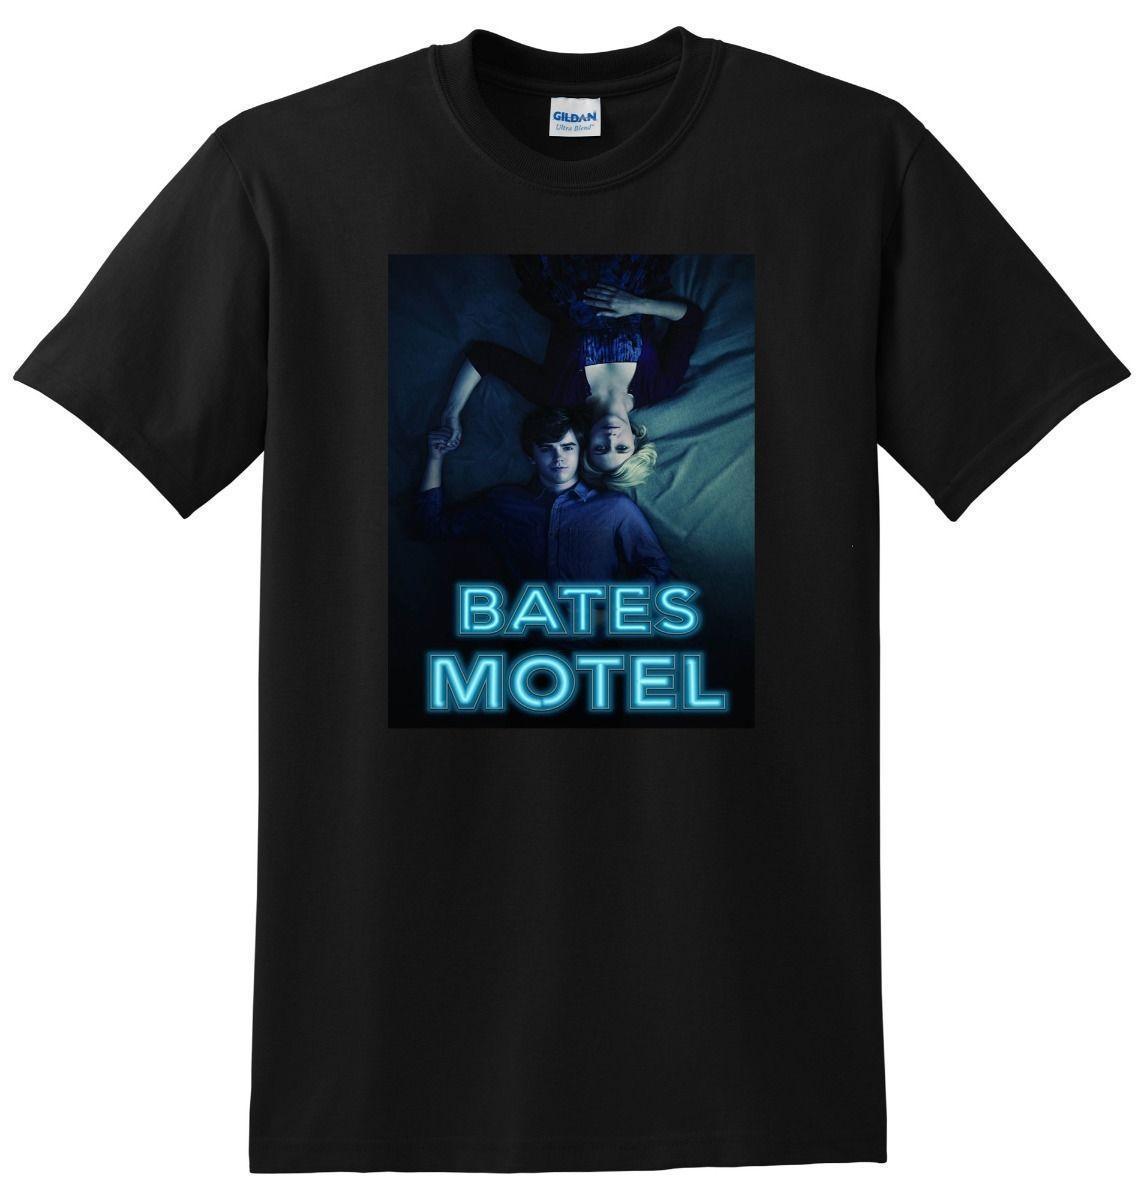 d4c08088d82b1  NEW  BATES MOTEL T SHIRT Season 1 2 3 Bluray Dvd Poster SMALL MEDIUM LARGE  XL Comfortable T Shirt Casual Short Sleeve Print Purchase T Shirts Silly T  Shirt ...